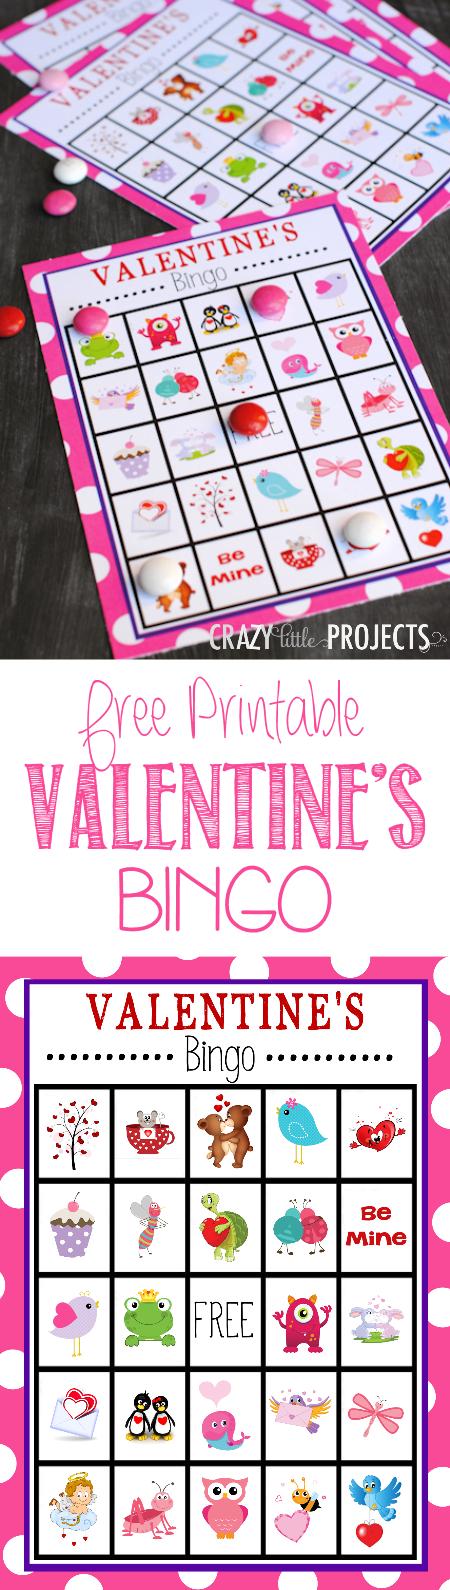 Free Printable Valentine's Bingo Game to Print and Play #valentinesbingo #valentinesday #partygames #bingo